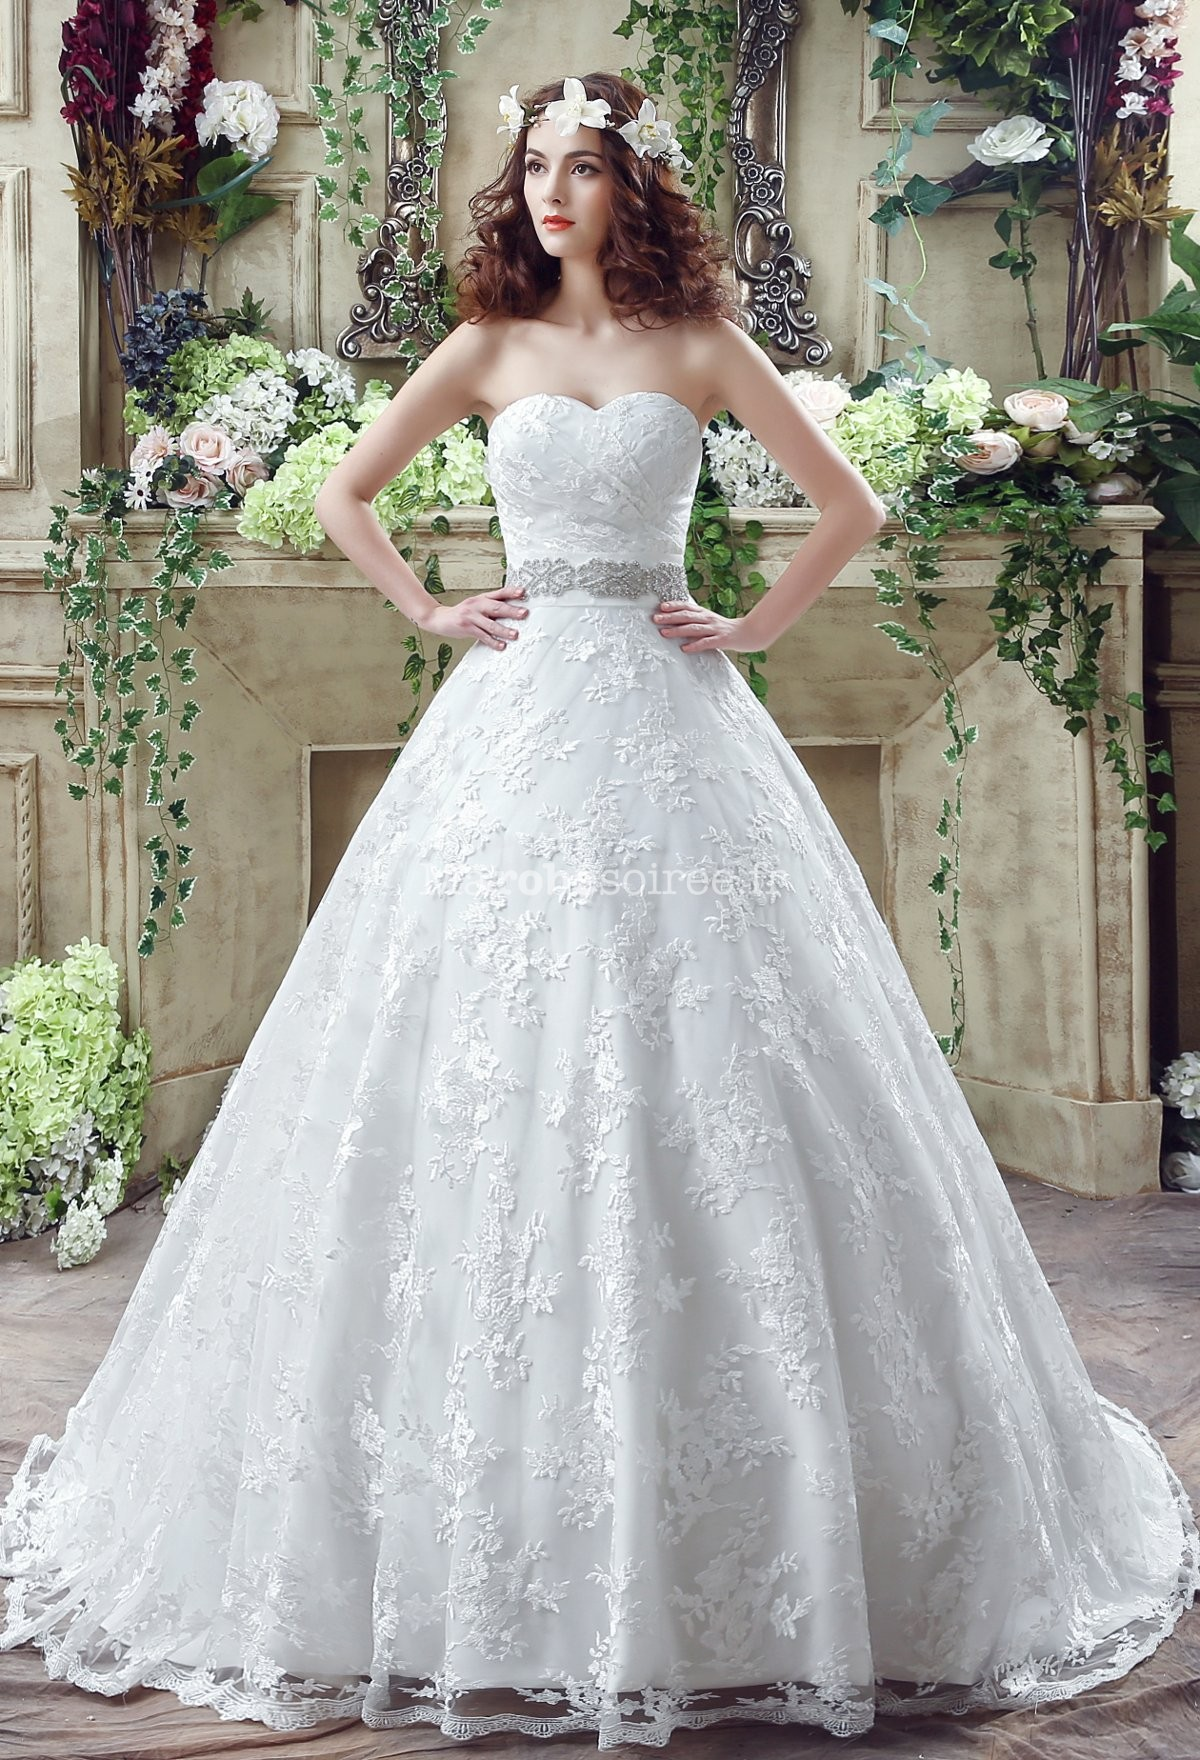 Robe de marie princesse Vente de gros Robe de marie